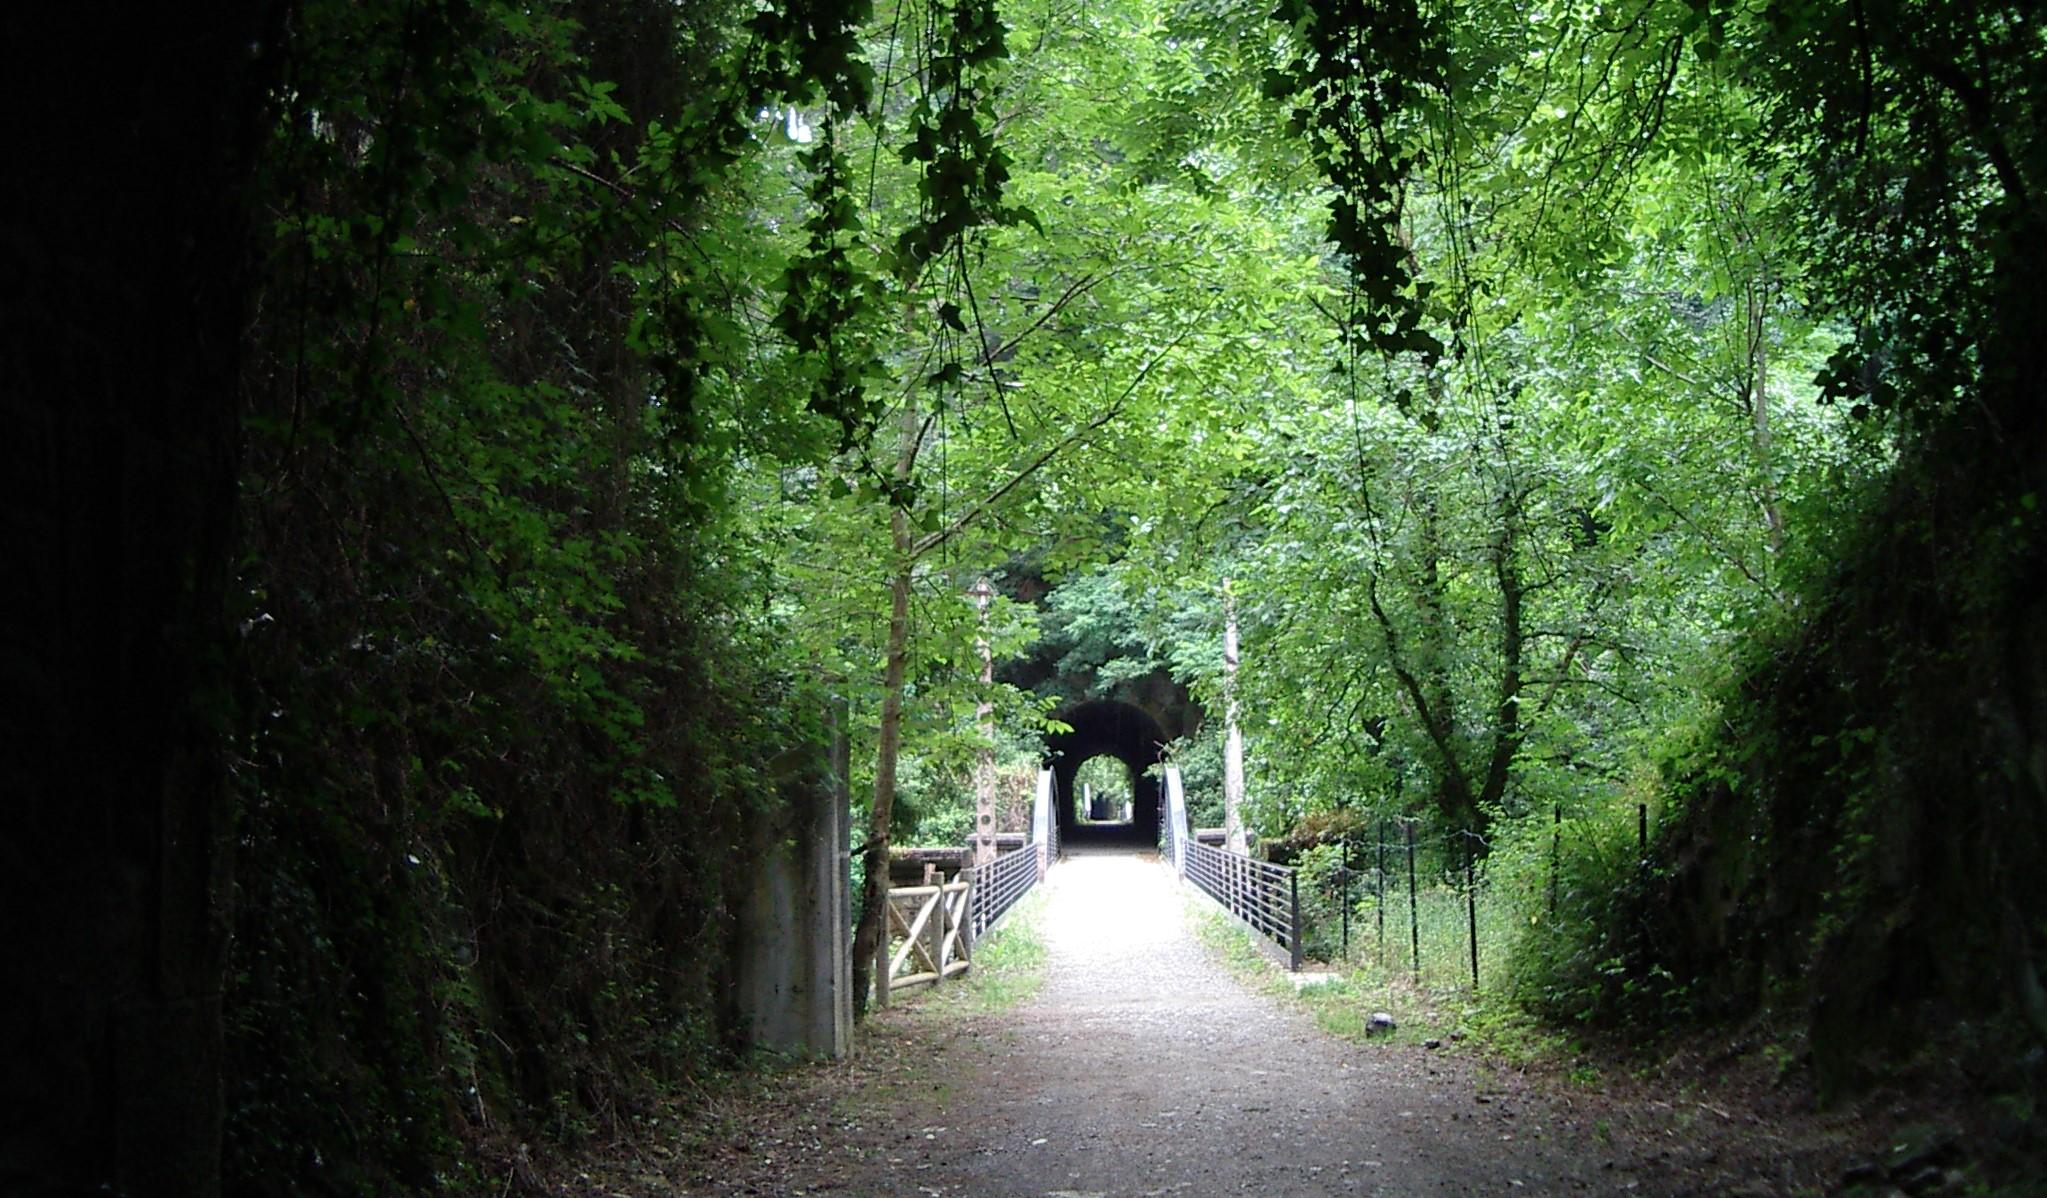 Via Verde del urola irudia - urolaturismoa